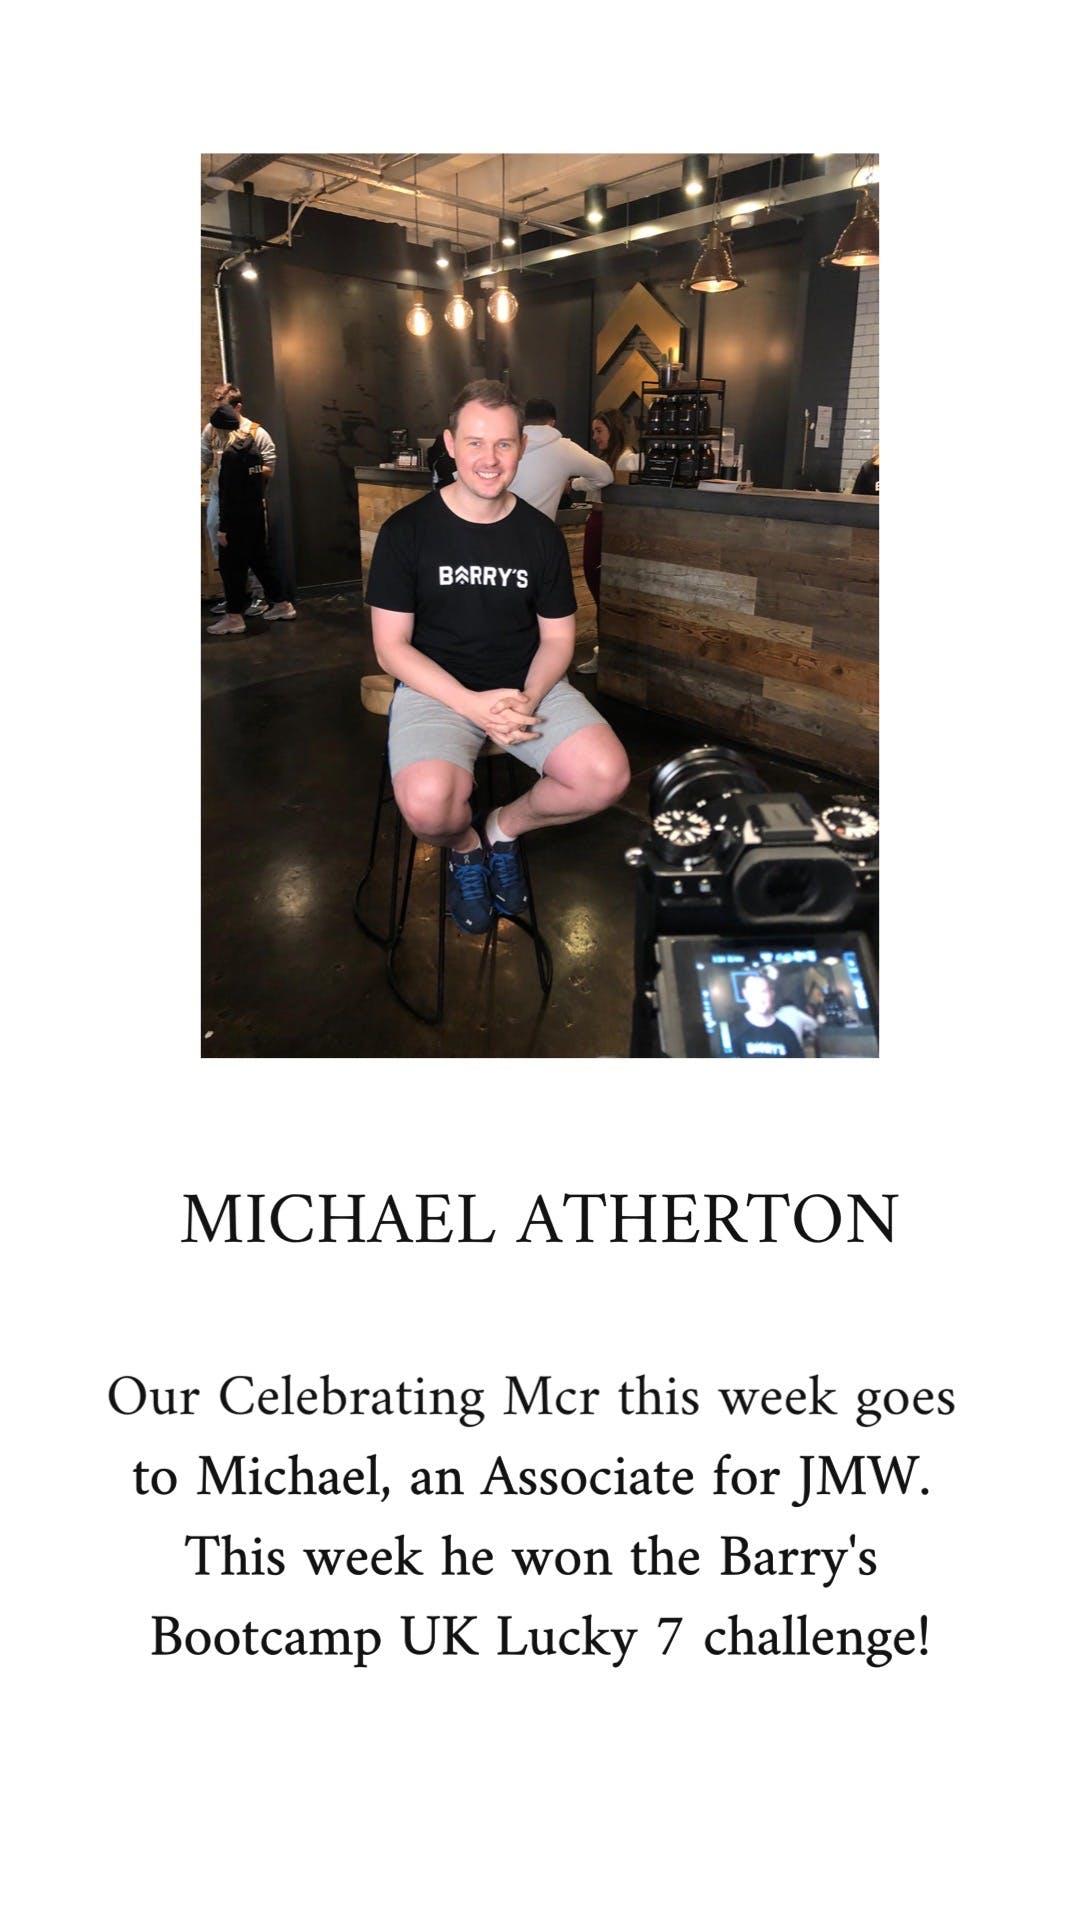 michael atherton bio